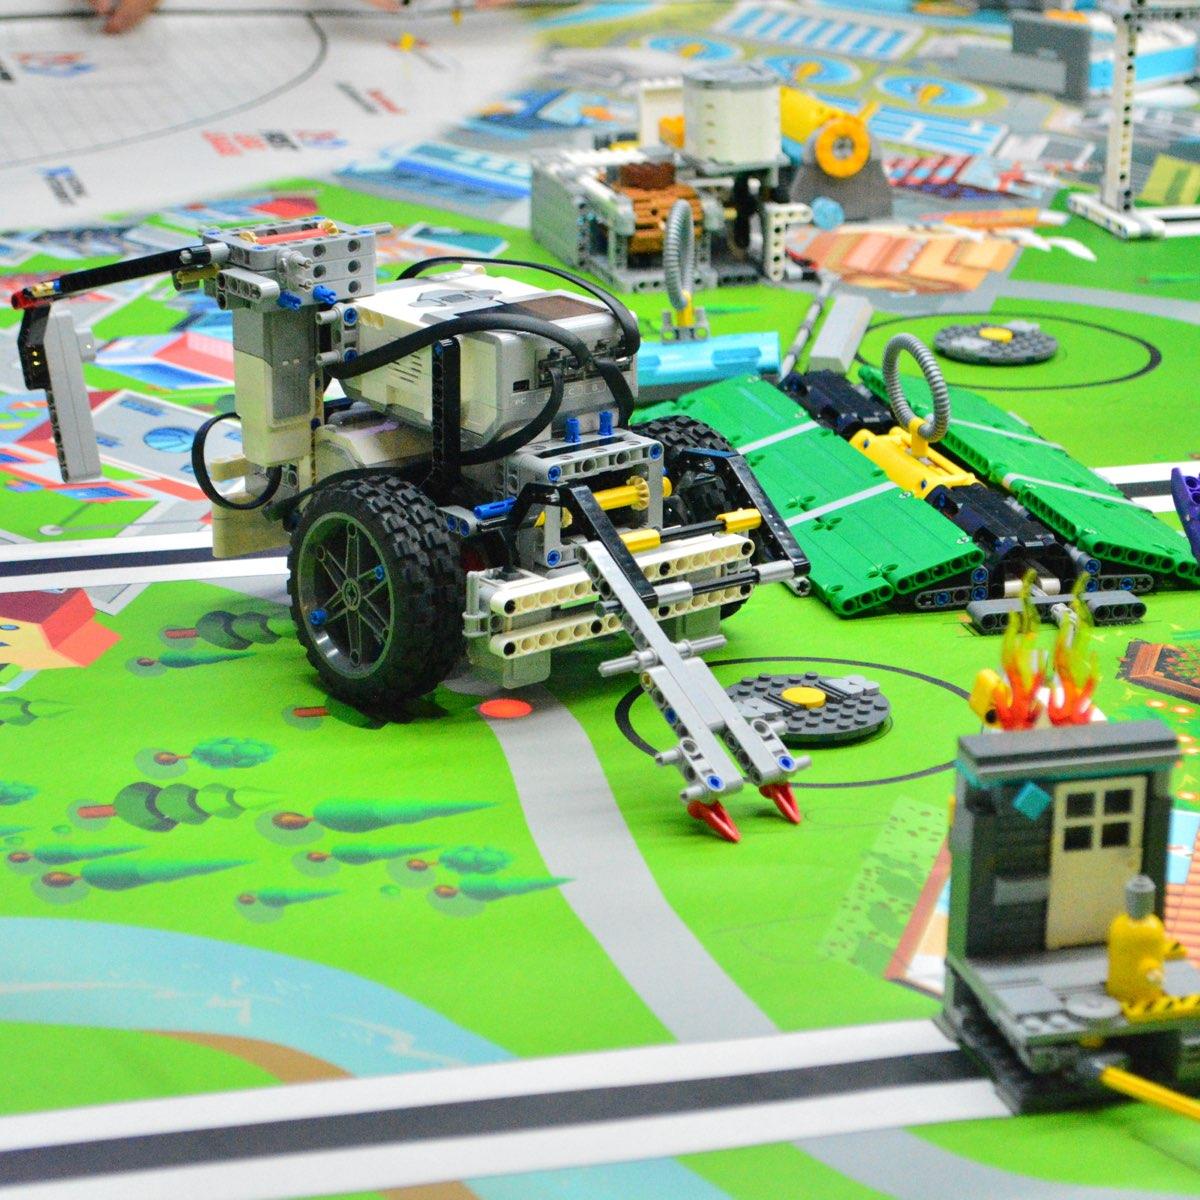 AAI FIRST LEGO Robotics League